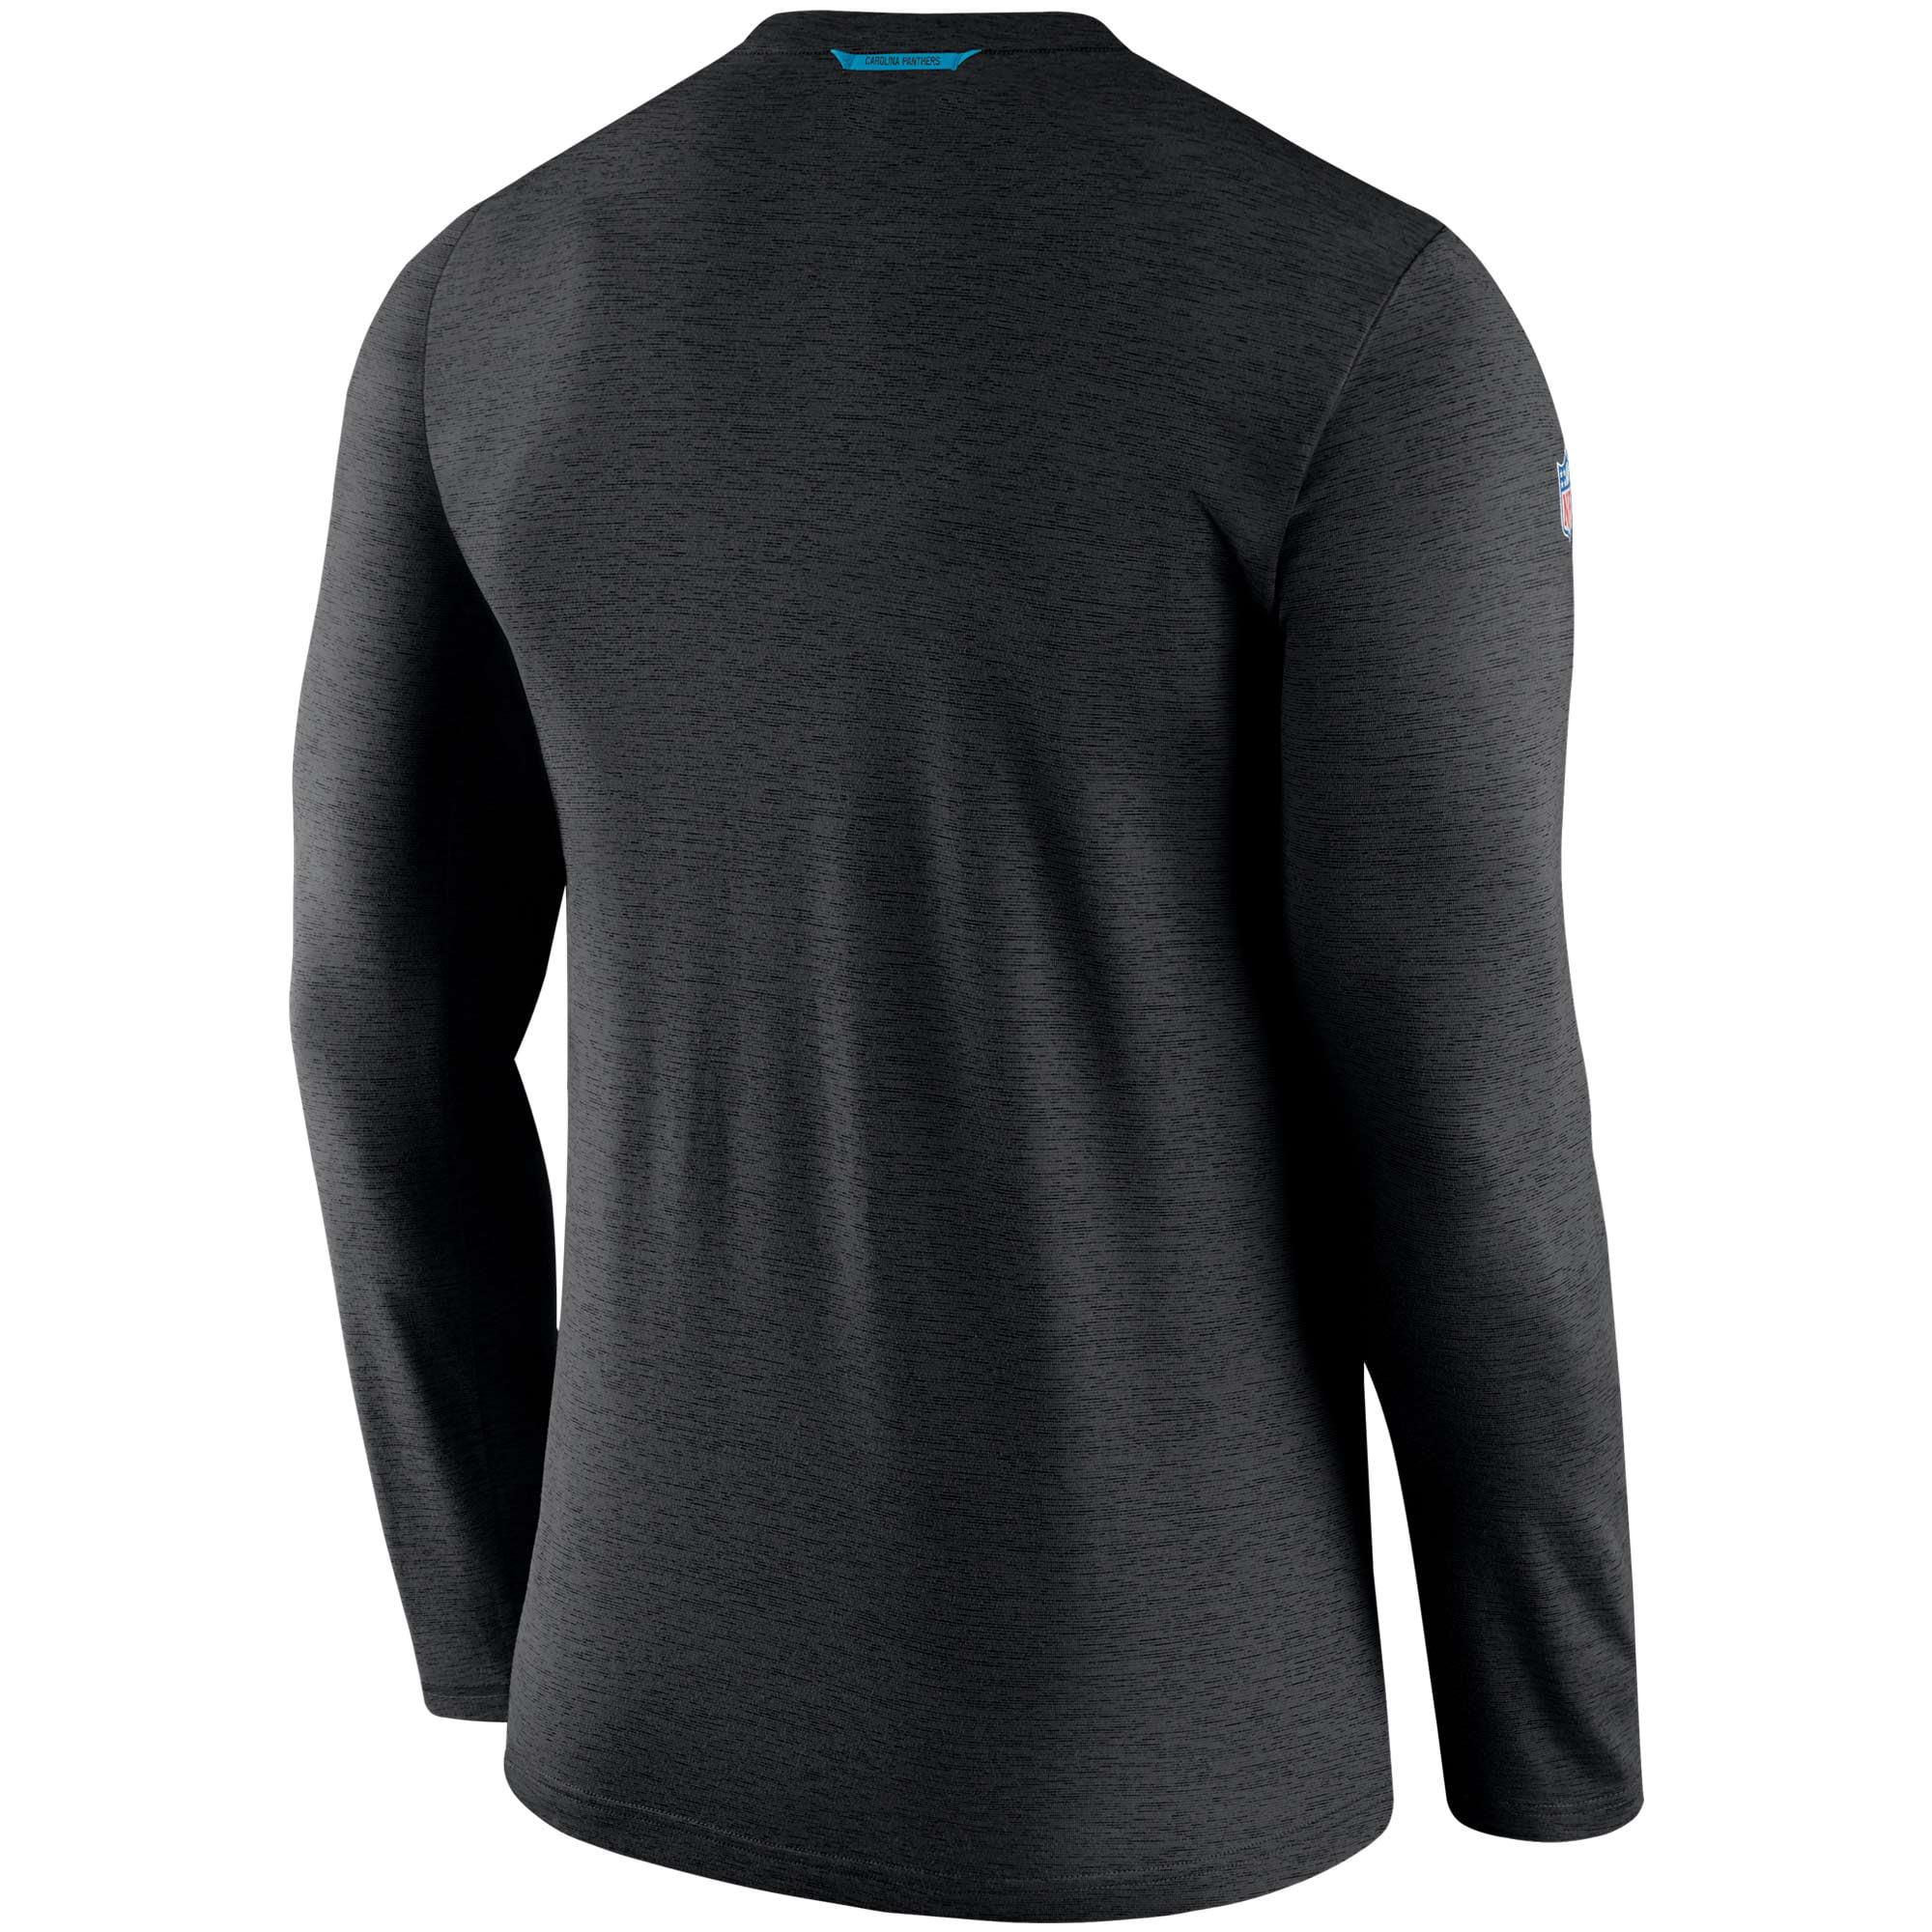 carolina panthers long sleeve jersey